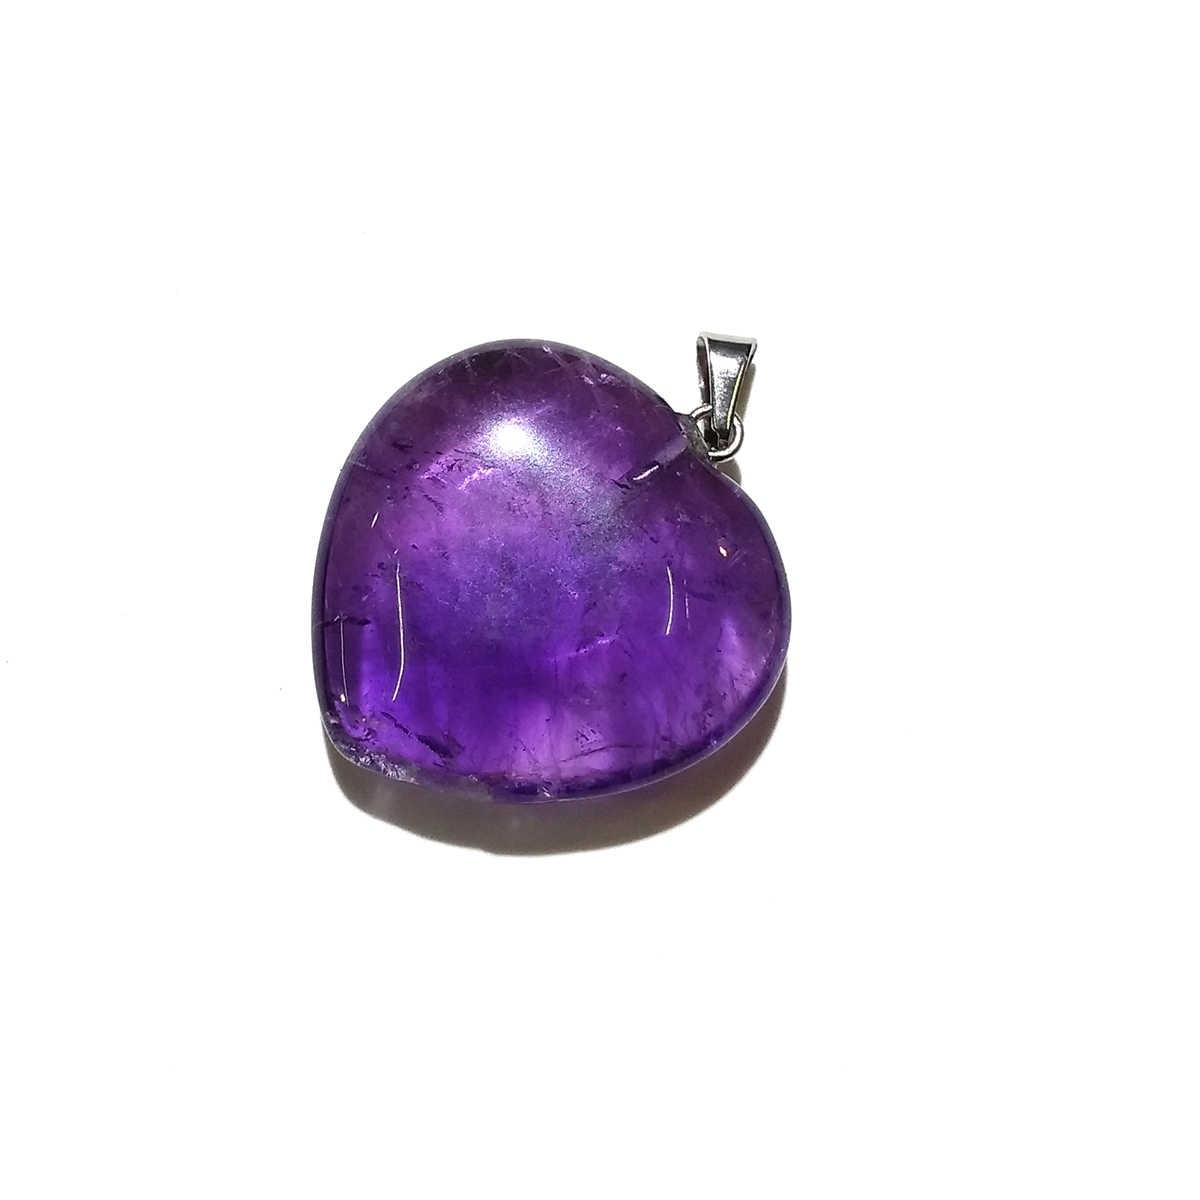 Amethysts הטבעי תליוני לב צורת מזל אבן קריסטל תליון עבור תכשיטי ביצוע שרשרת